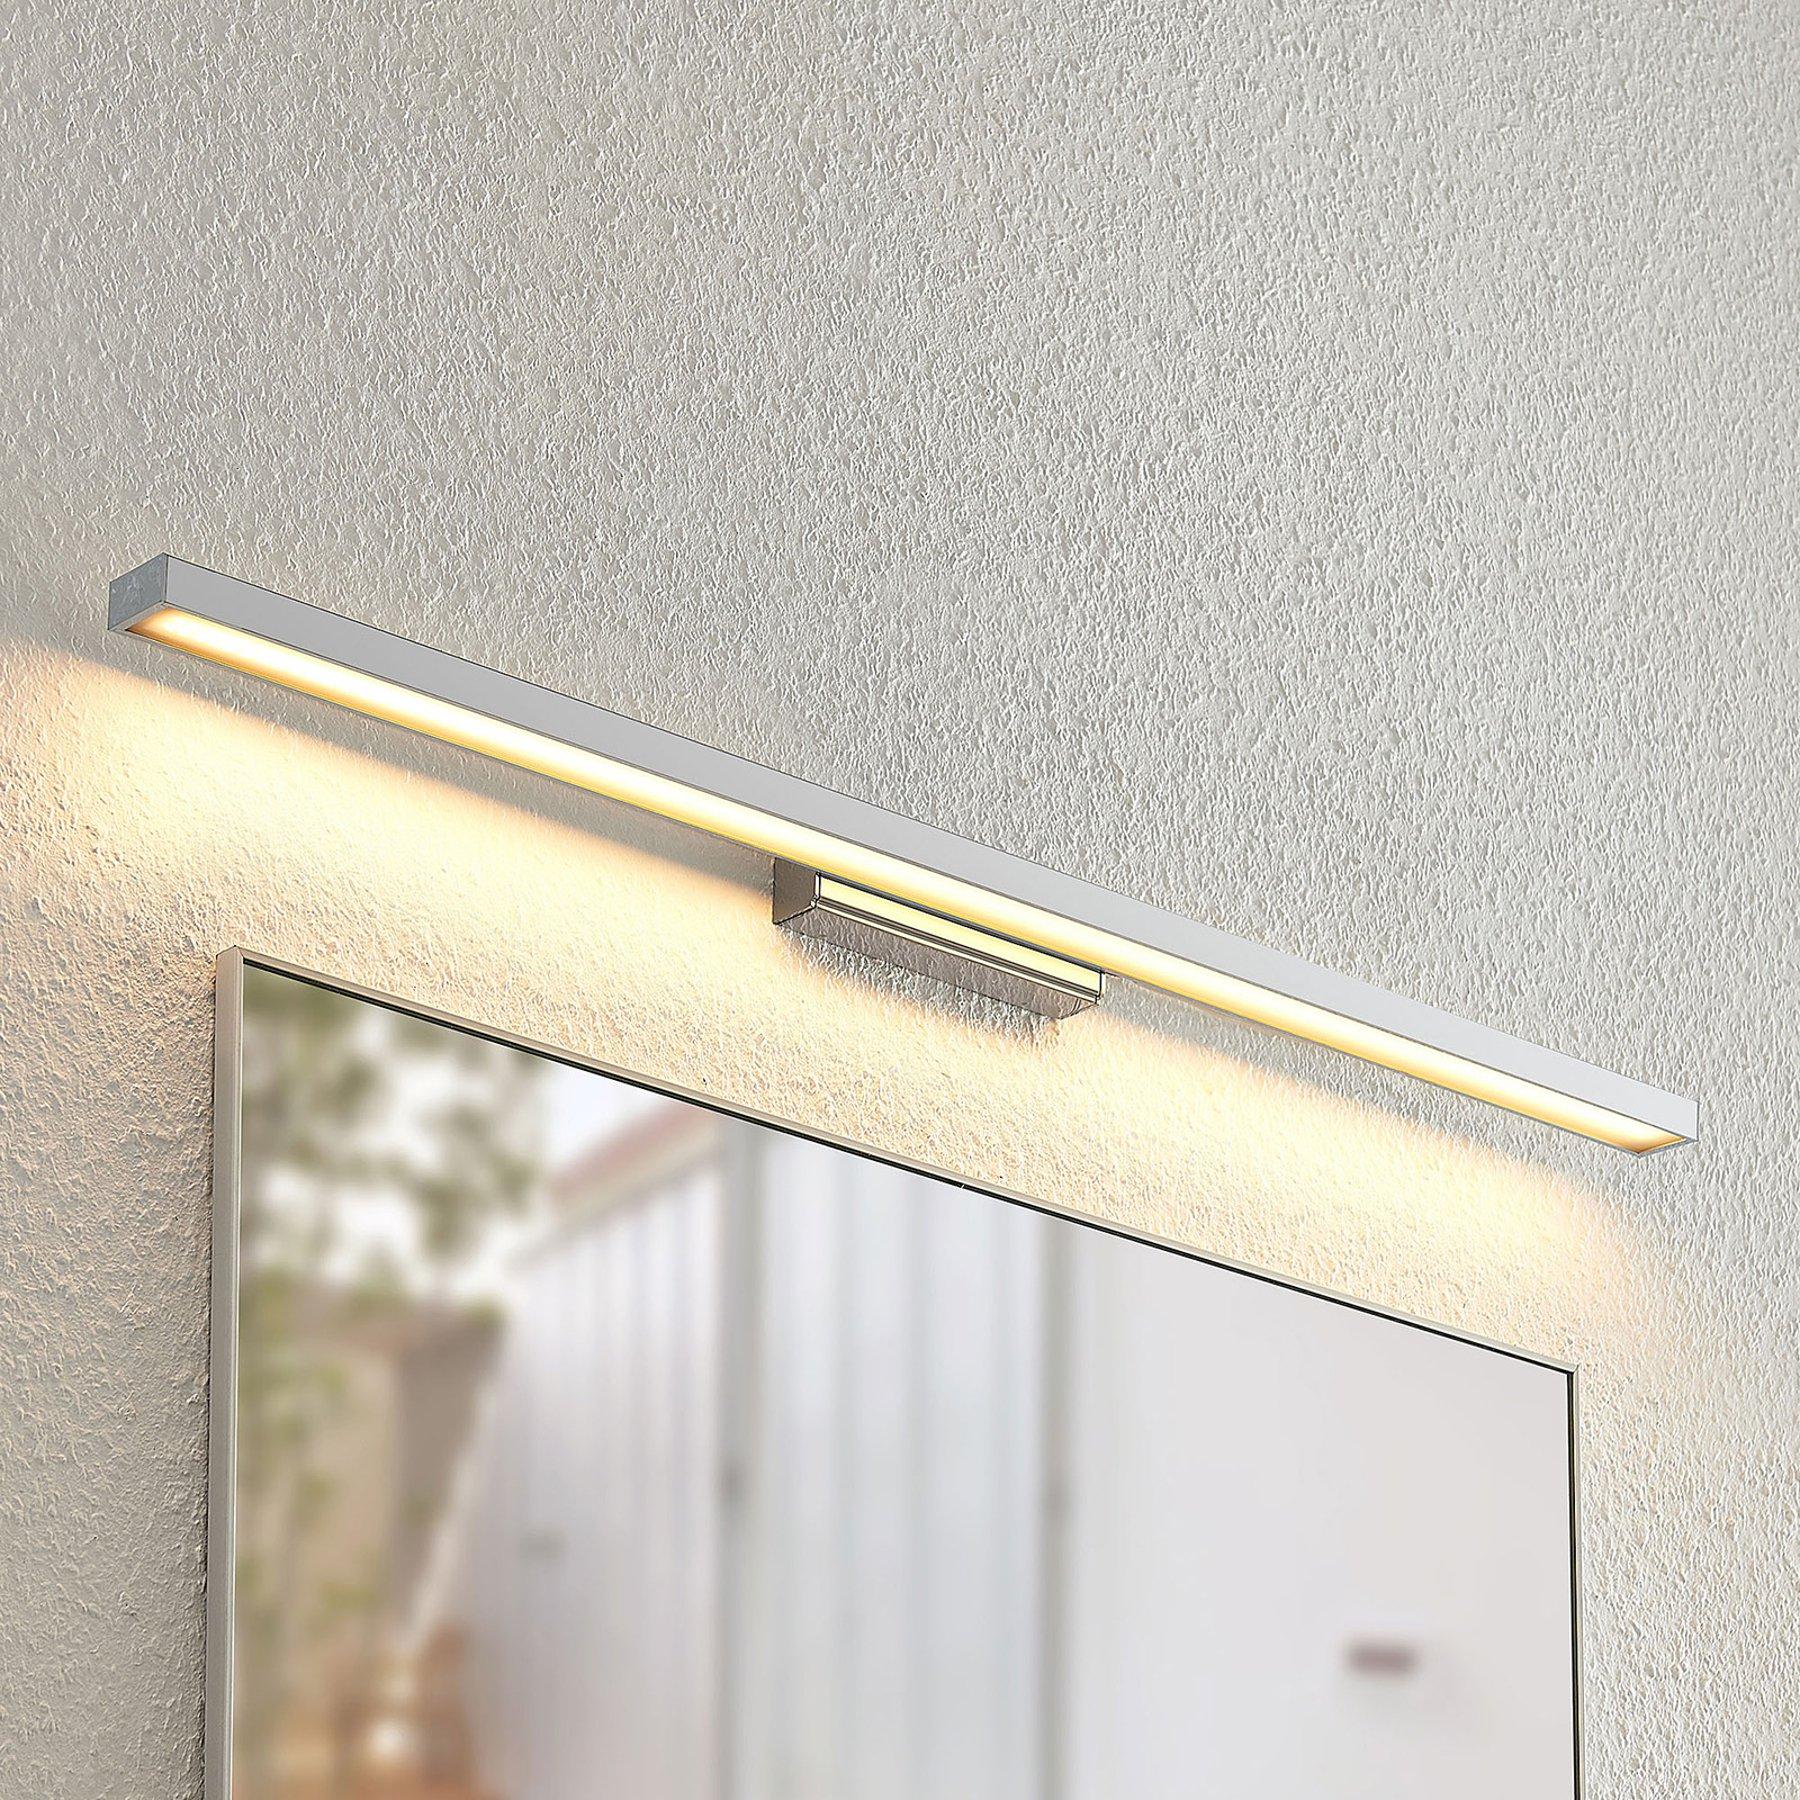 Lindby Alenia LED-speillampe til bad, 90 cm